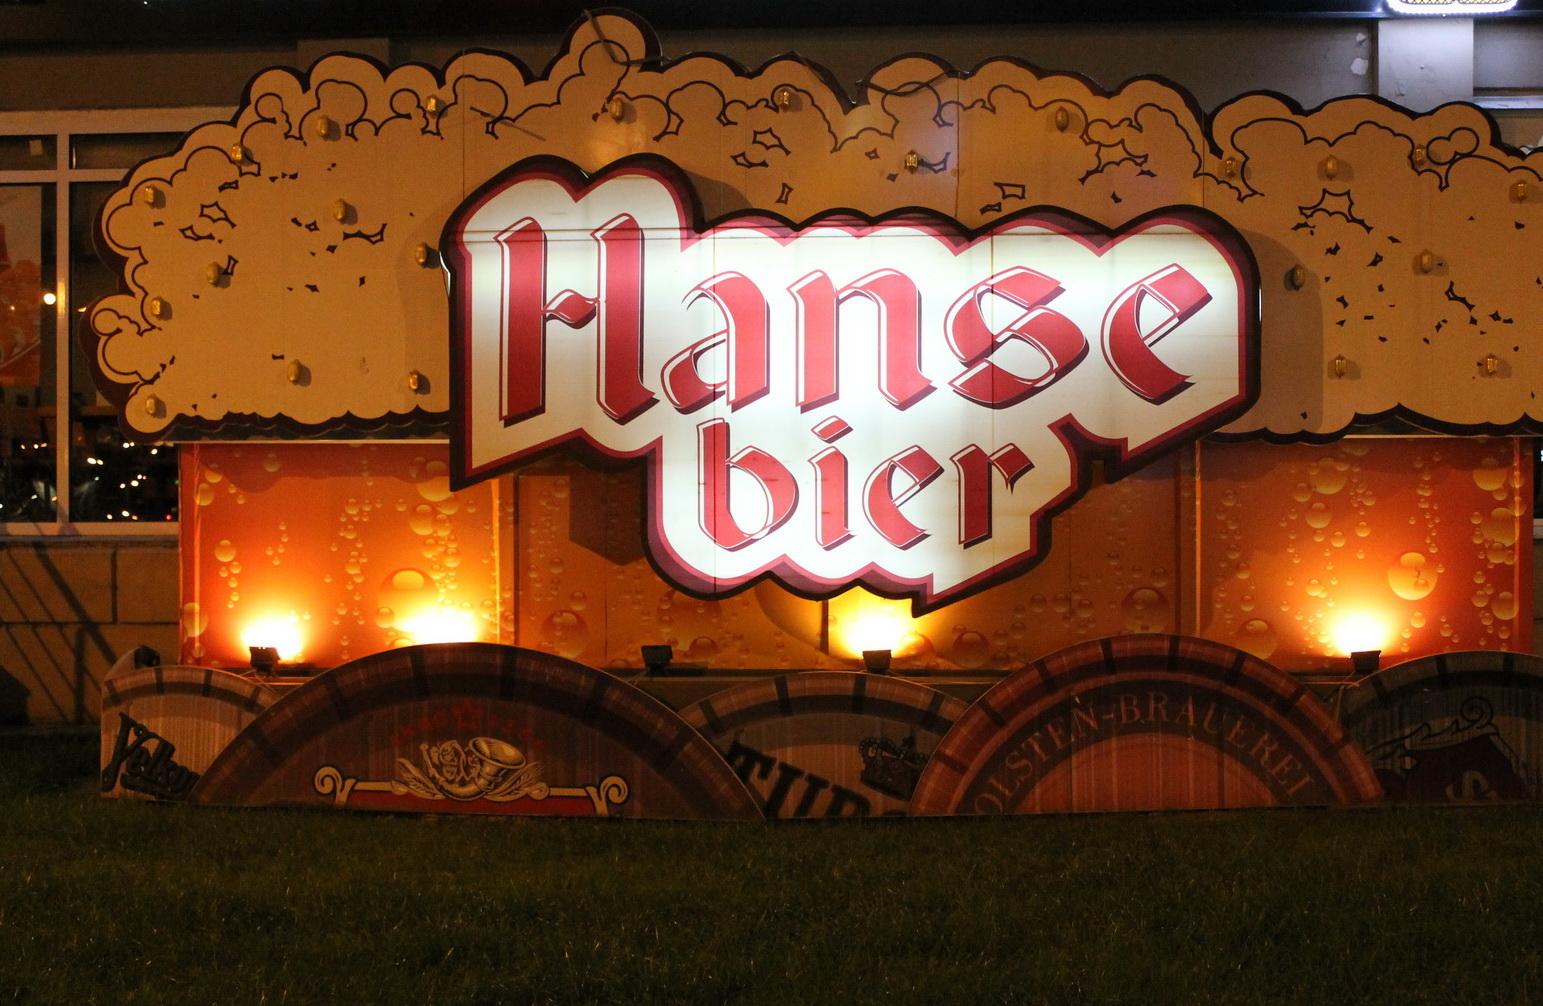 Hanse Bier. Часть 2